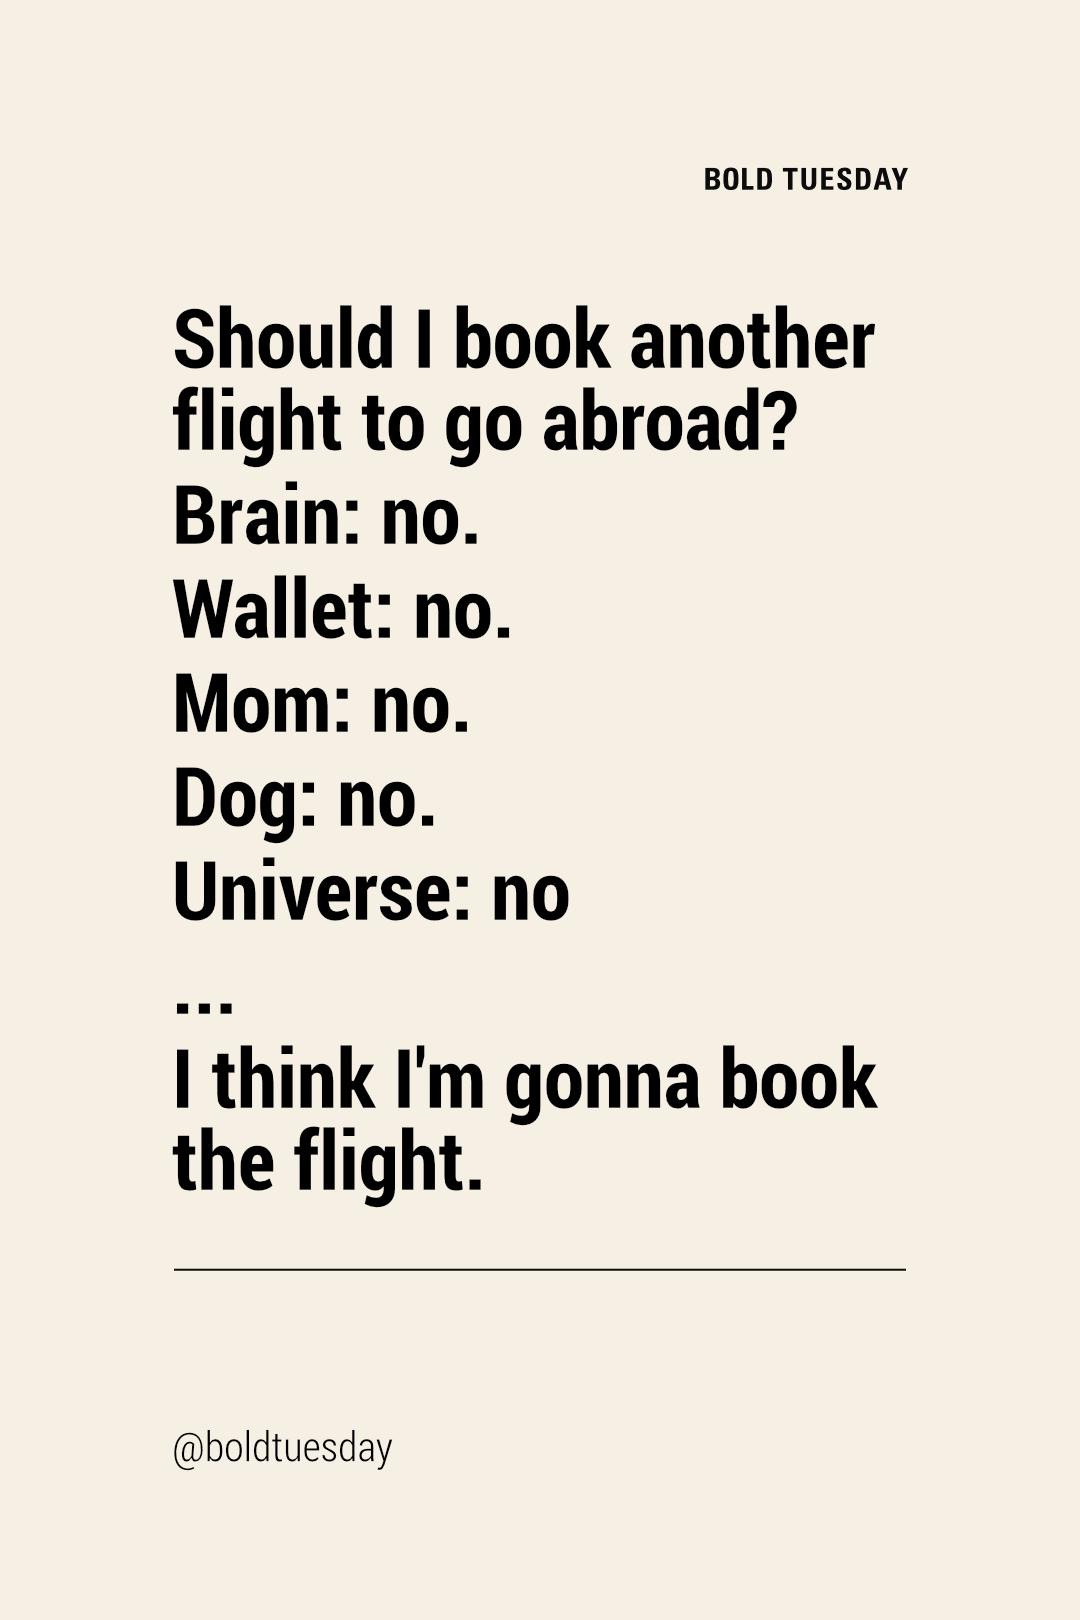 Cita de viaje imprimible # 39